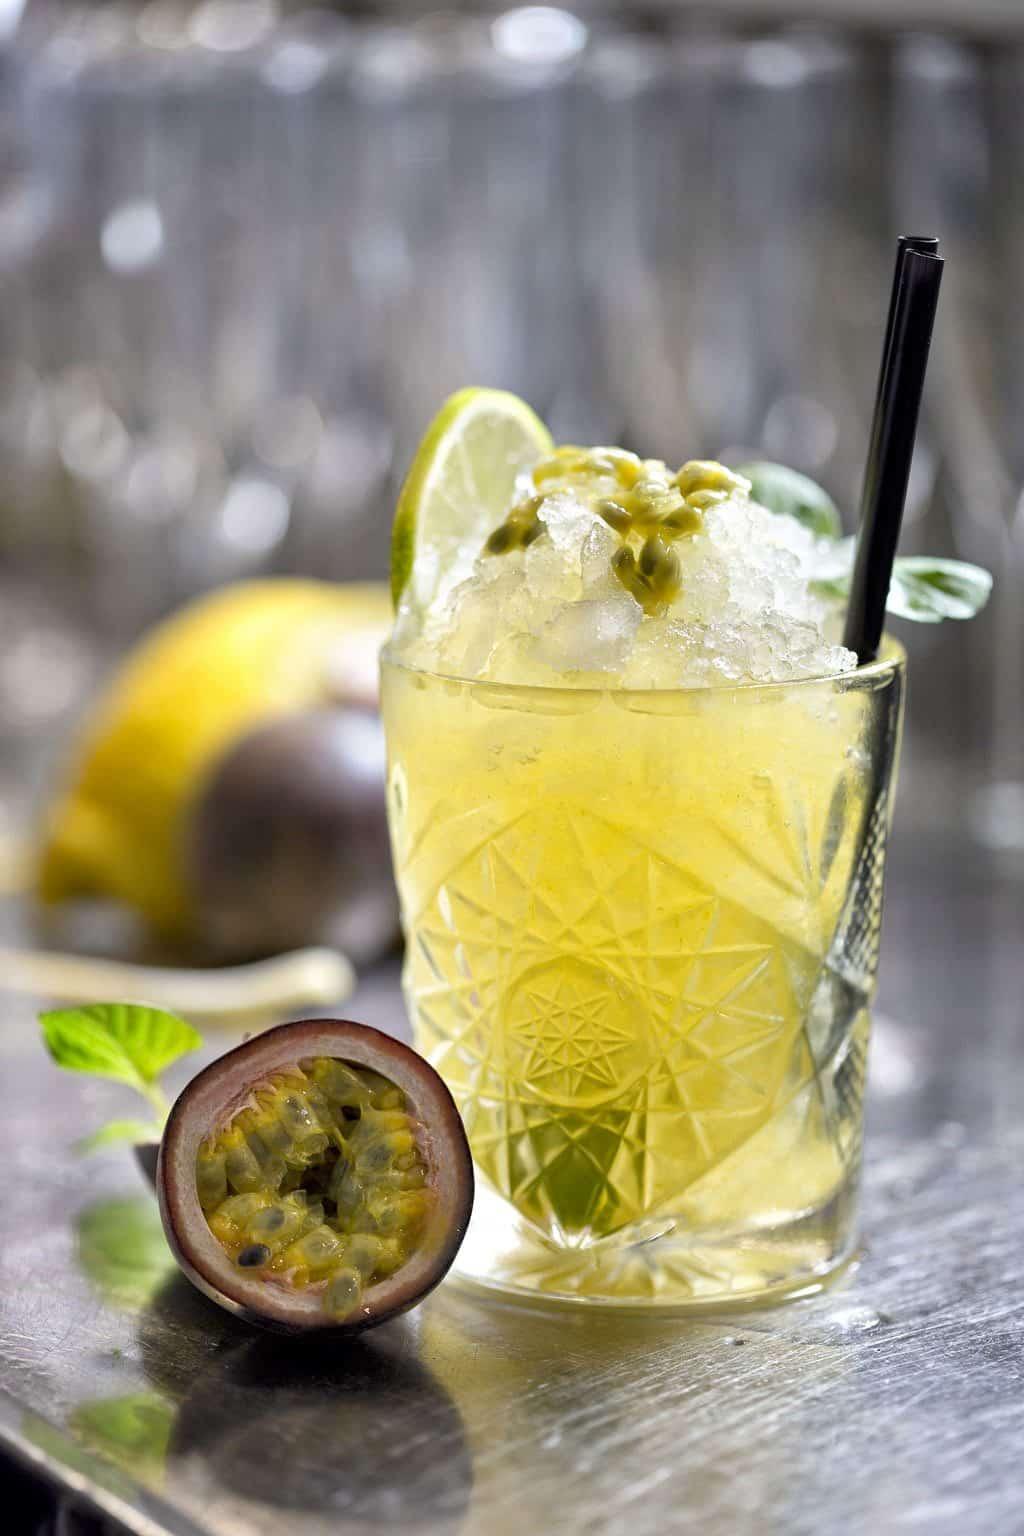 cocktail migliori, cocktail da lele, da lele riccione